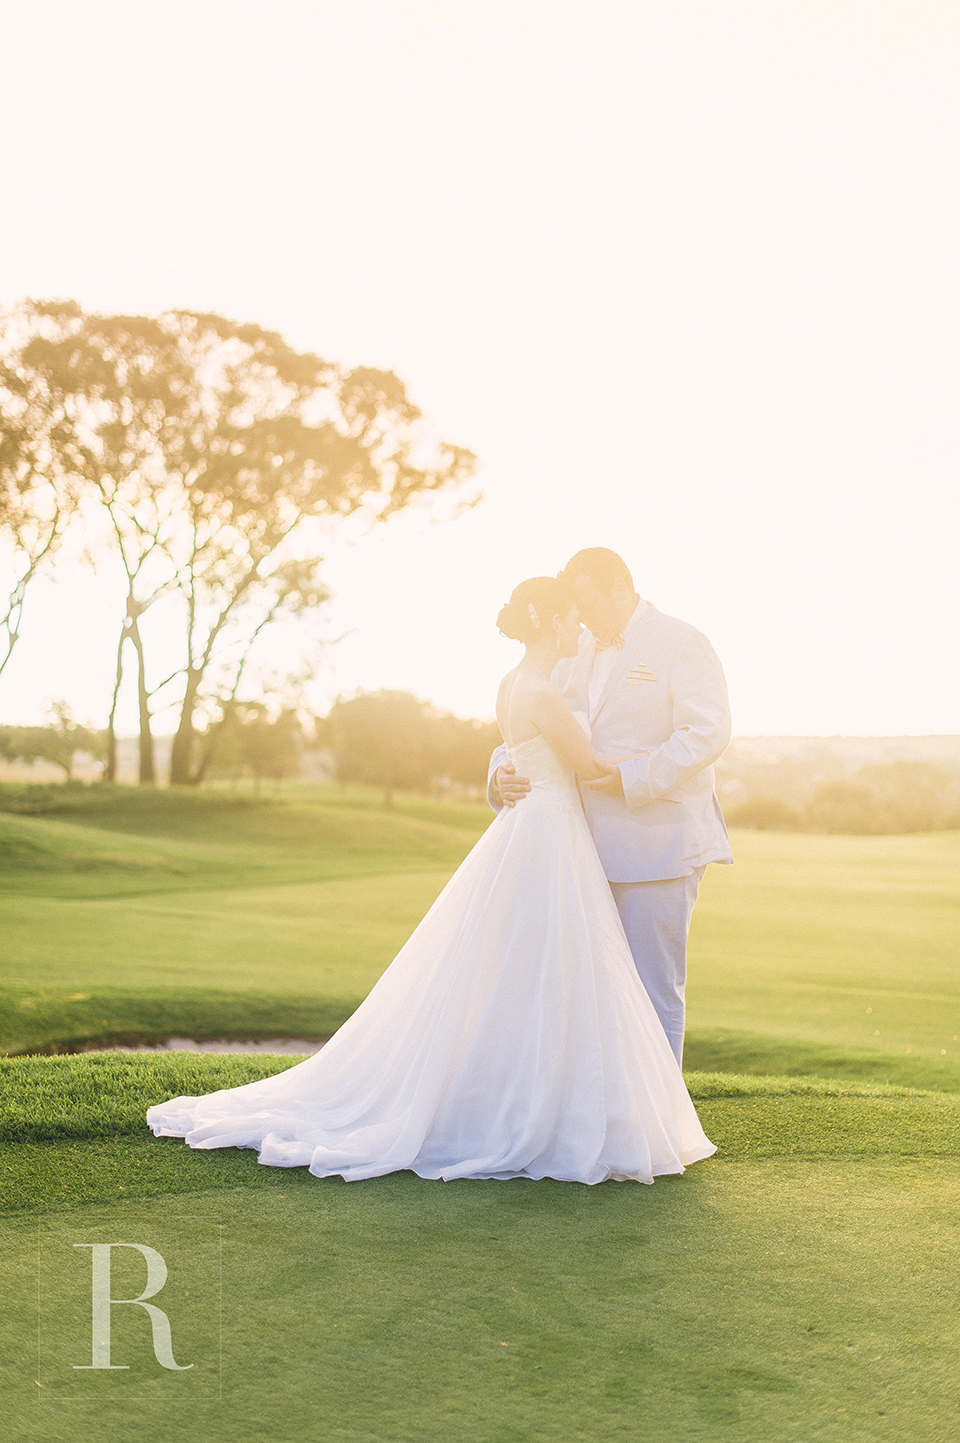 RYAN PARKER_WEDDING PHOTOGRAPHER_JOHANNESBURG_M&L DSC_7398.jpg